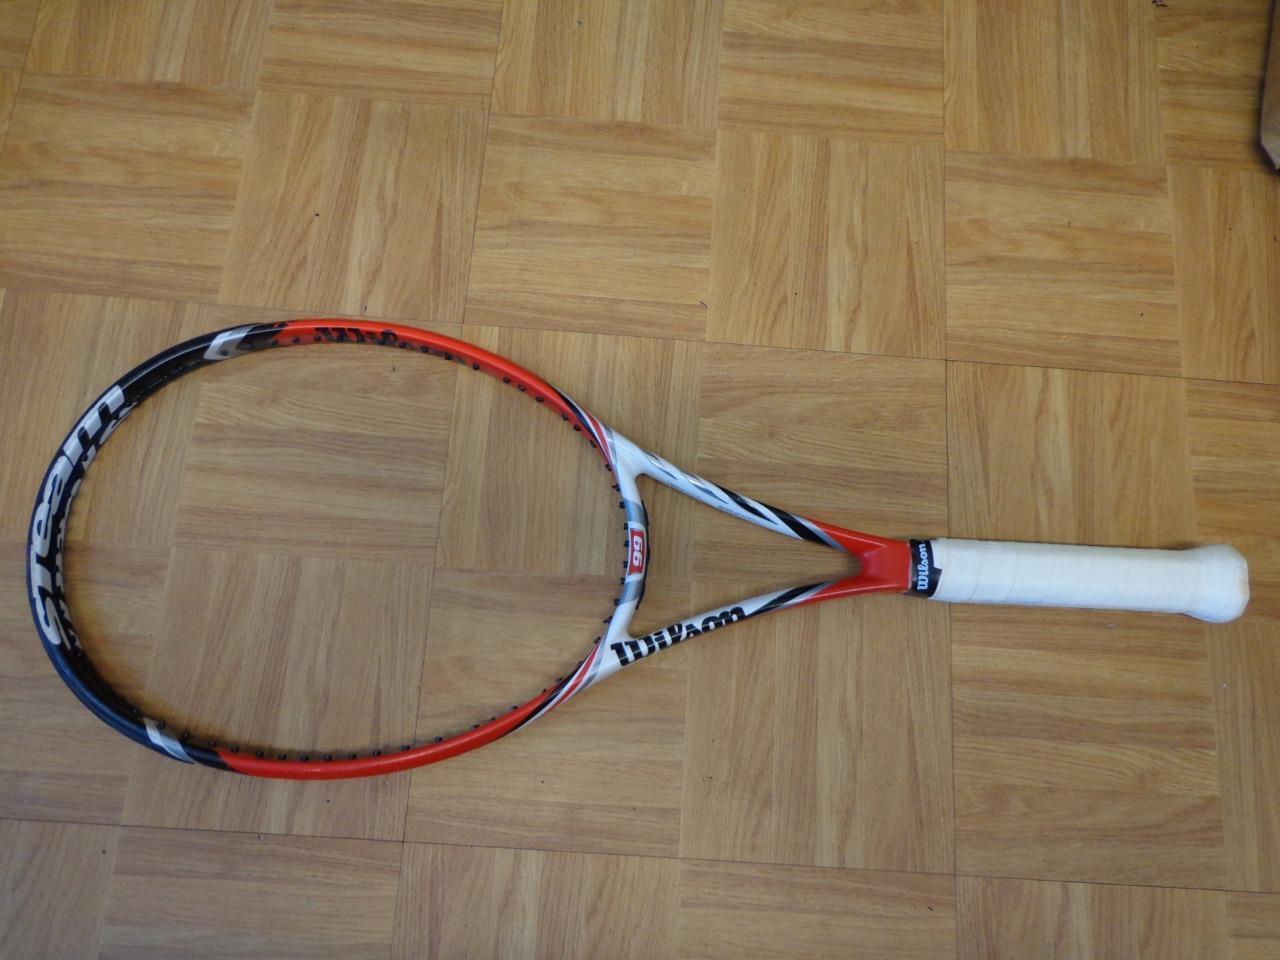 Wilson STEAM 99S headsize SPIN 99 head 4 4 4 1/4 grip Tennis Racquet cefbf0